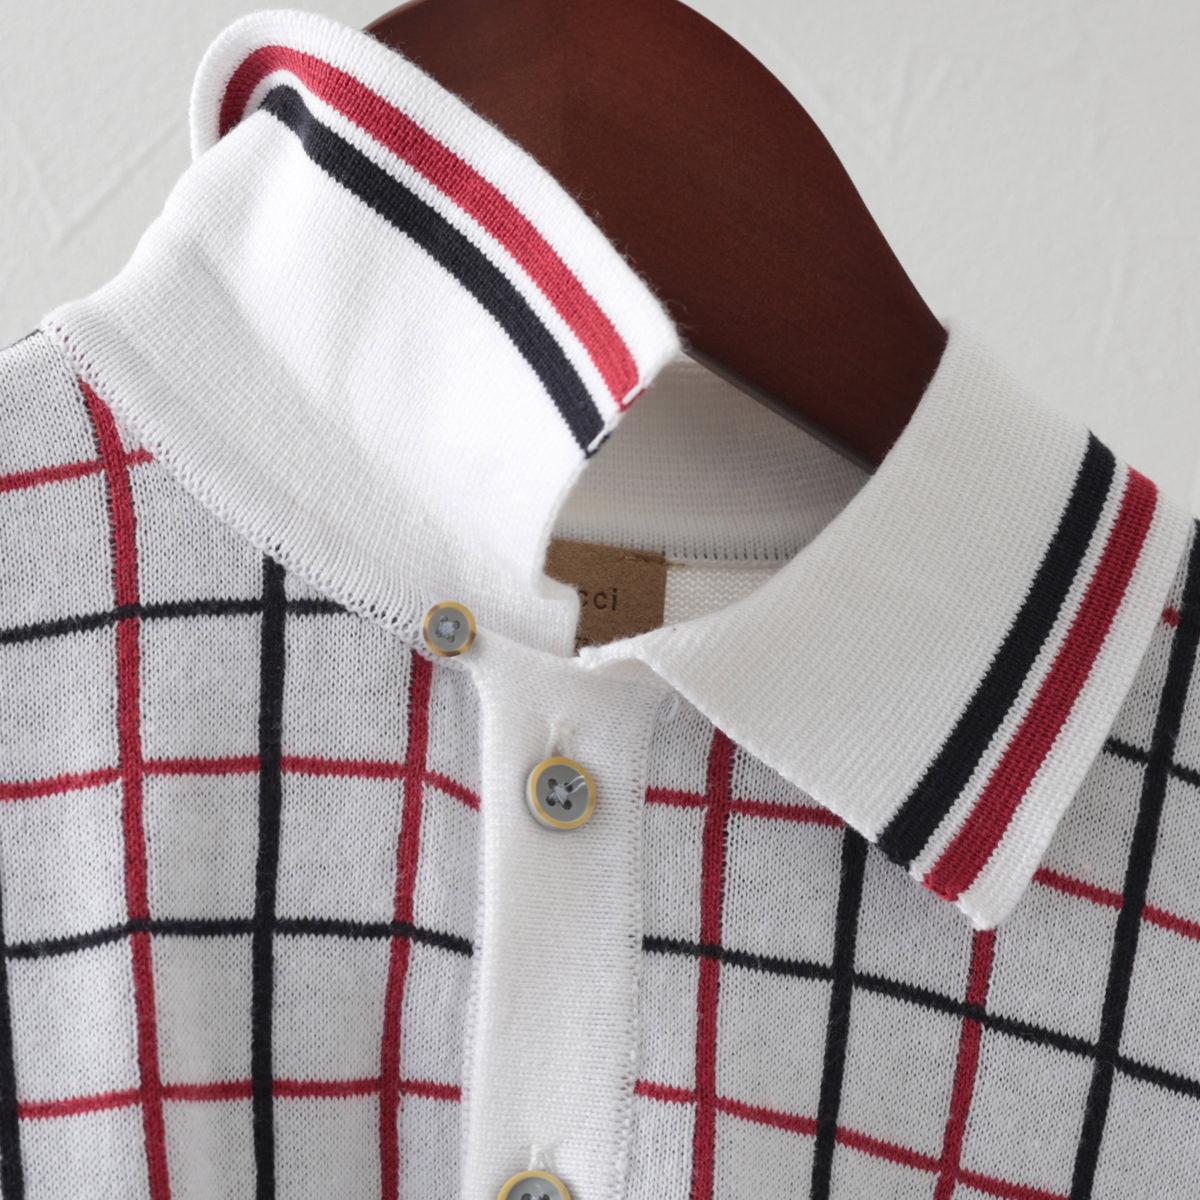 Gabicci メンズ ポロシャツ ポロ チェック ガビッチ ホワイト レトロ モッズファッション